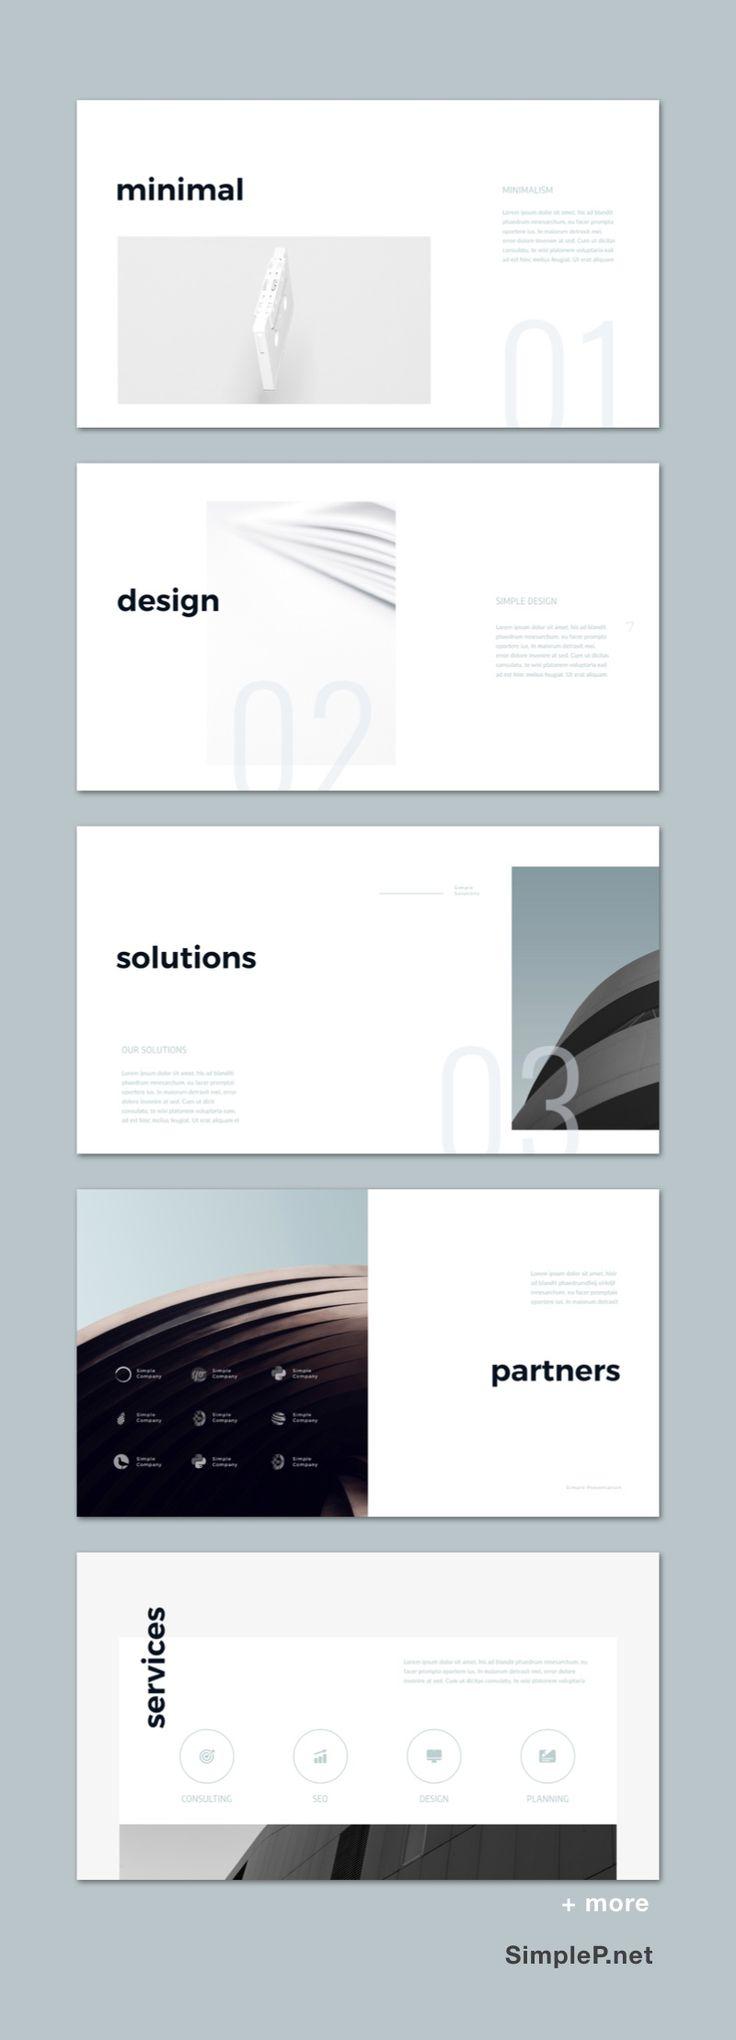 Simple Business Presentation Template #partners #s…